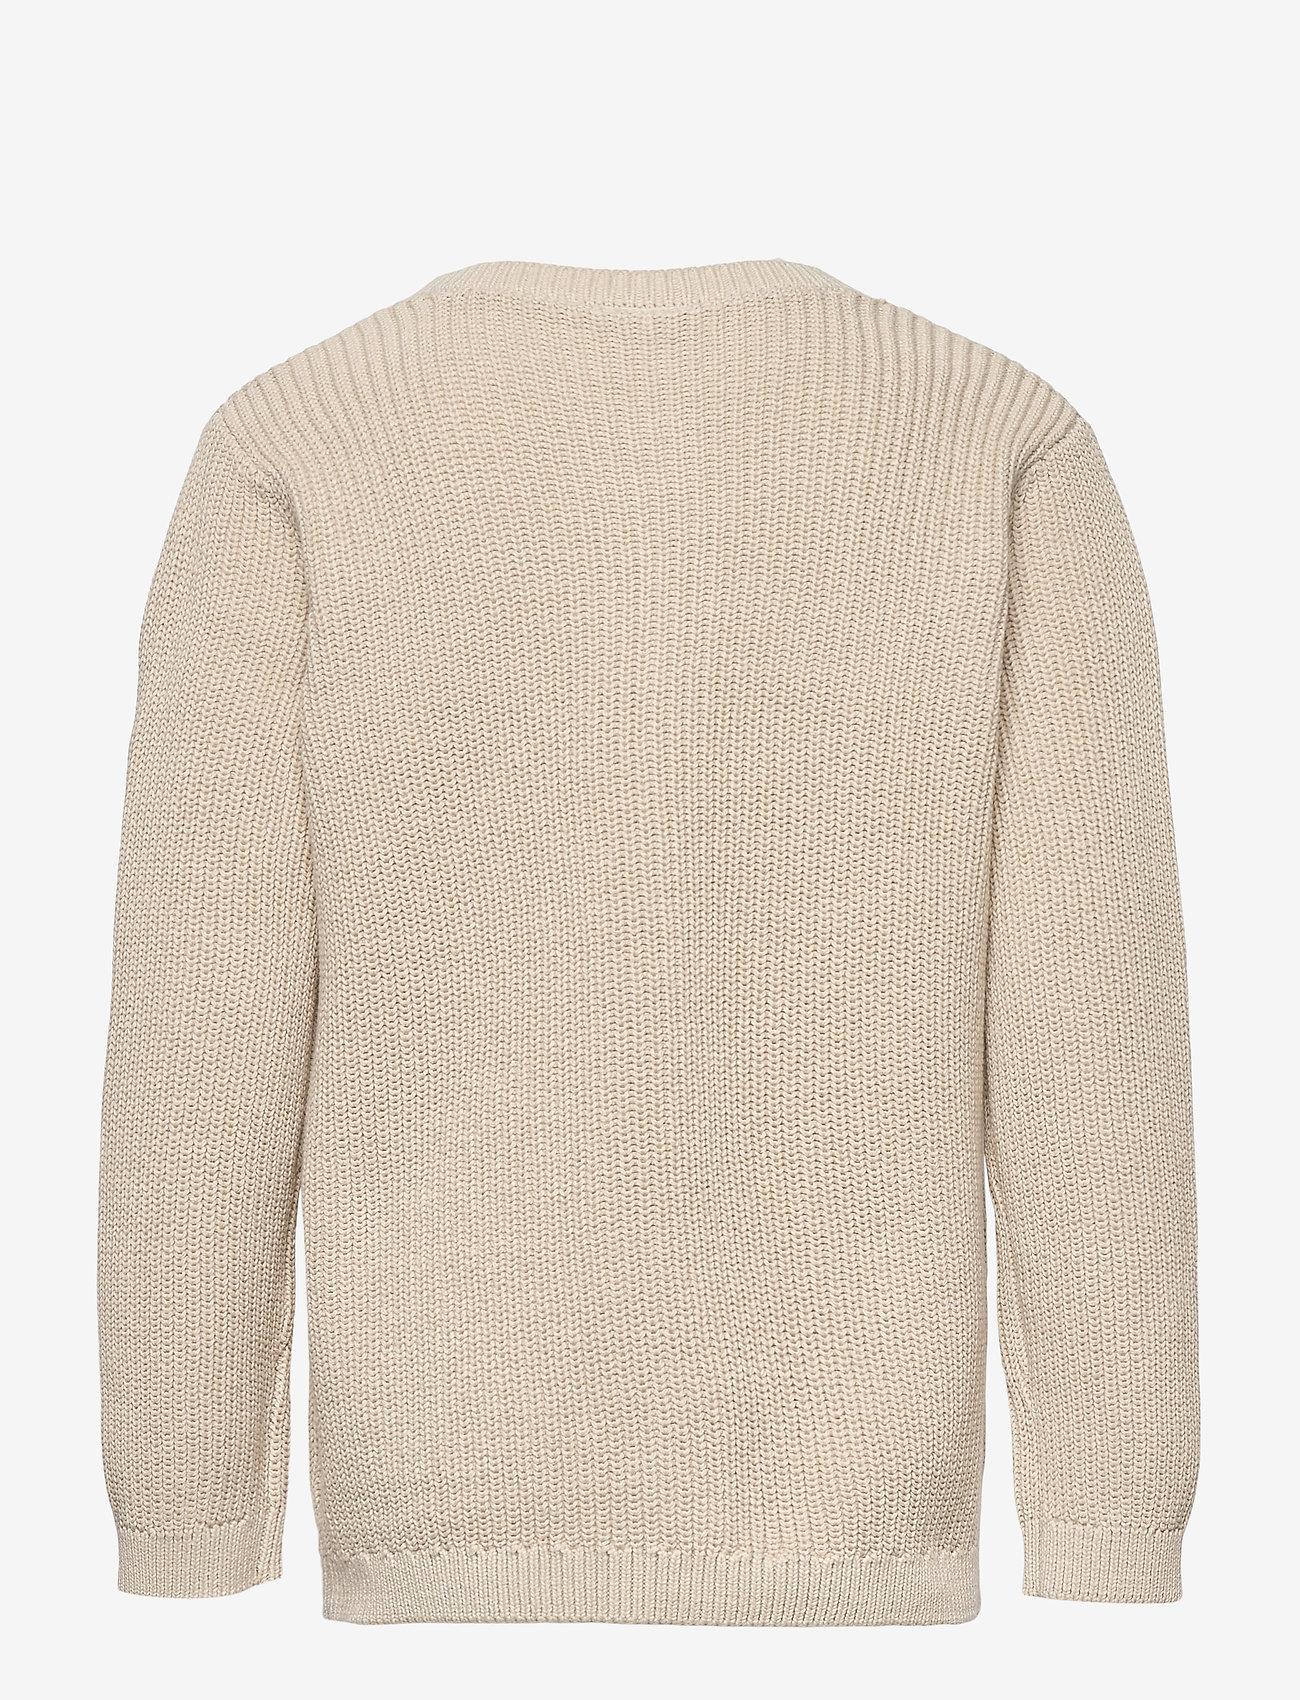 Lindex - Cardigan Patent knit - gilets - beige - 1